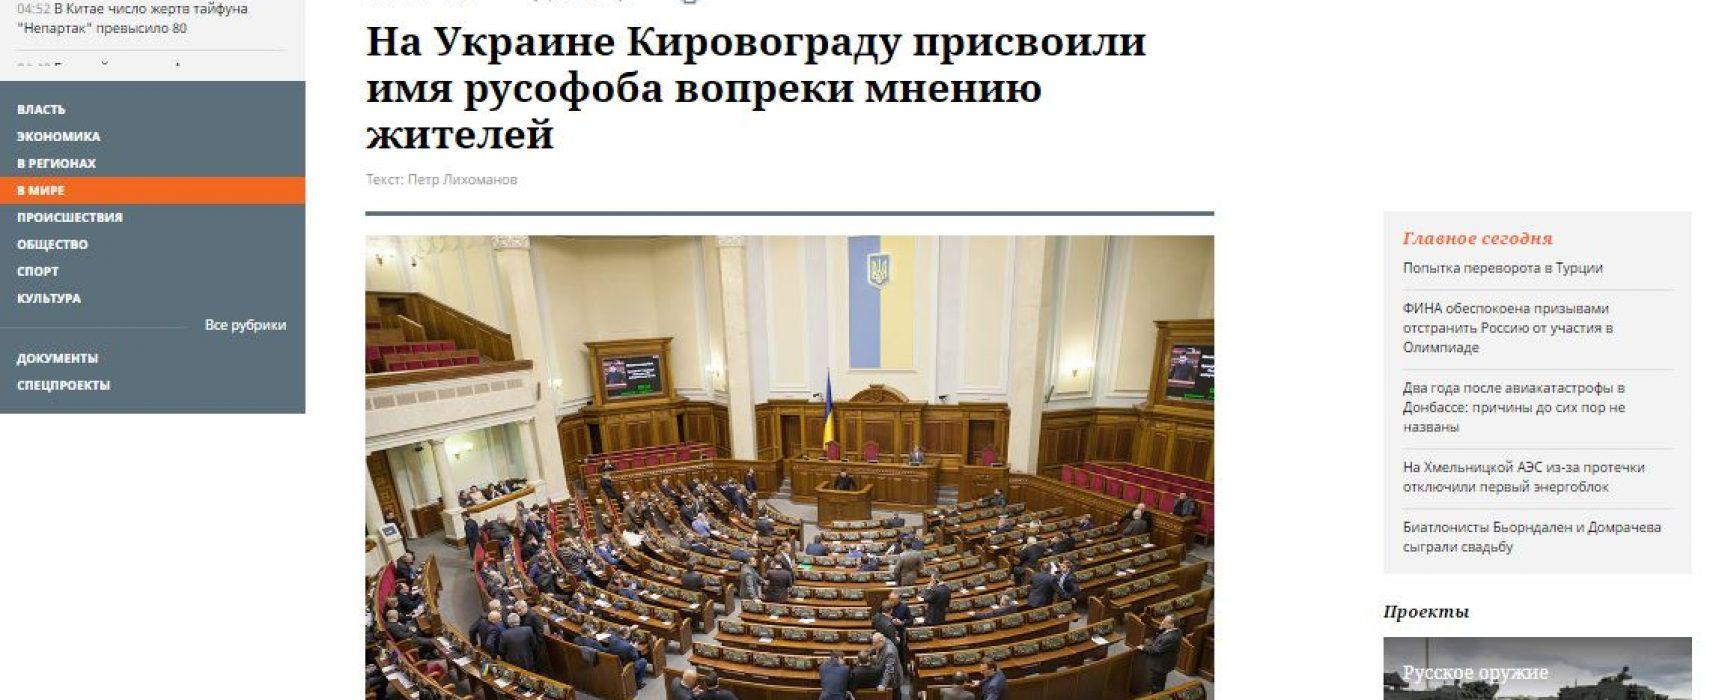 Fake: Kirovograd residents overwhelmingly prefer tsarist era name